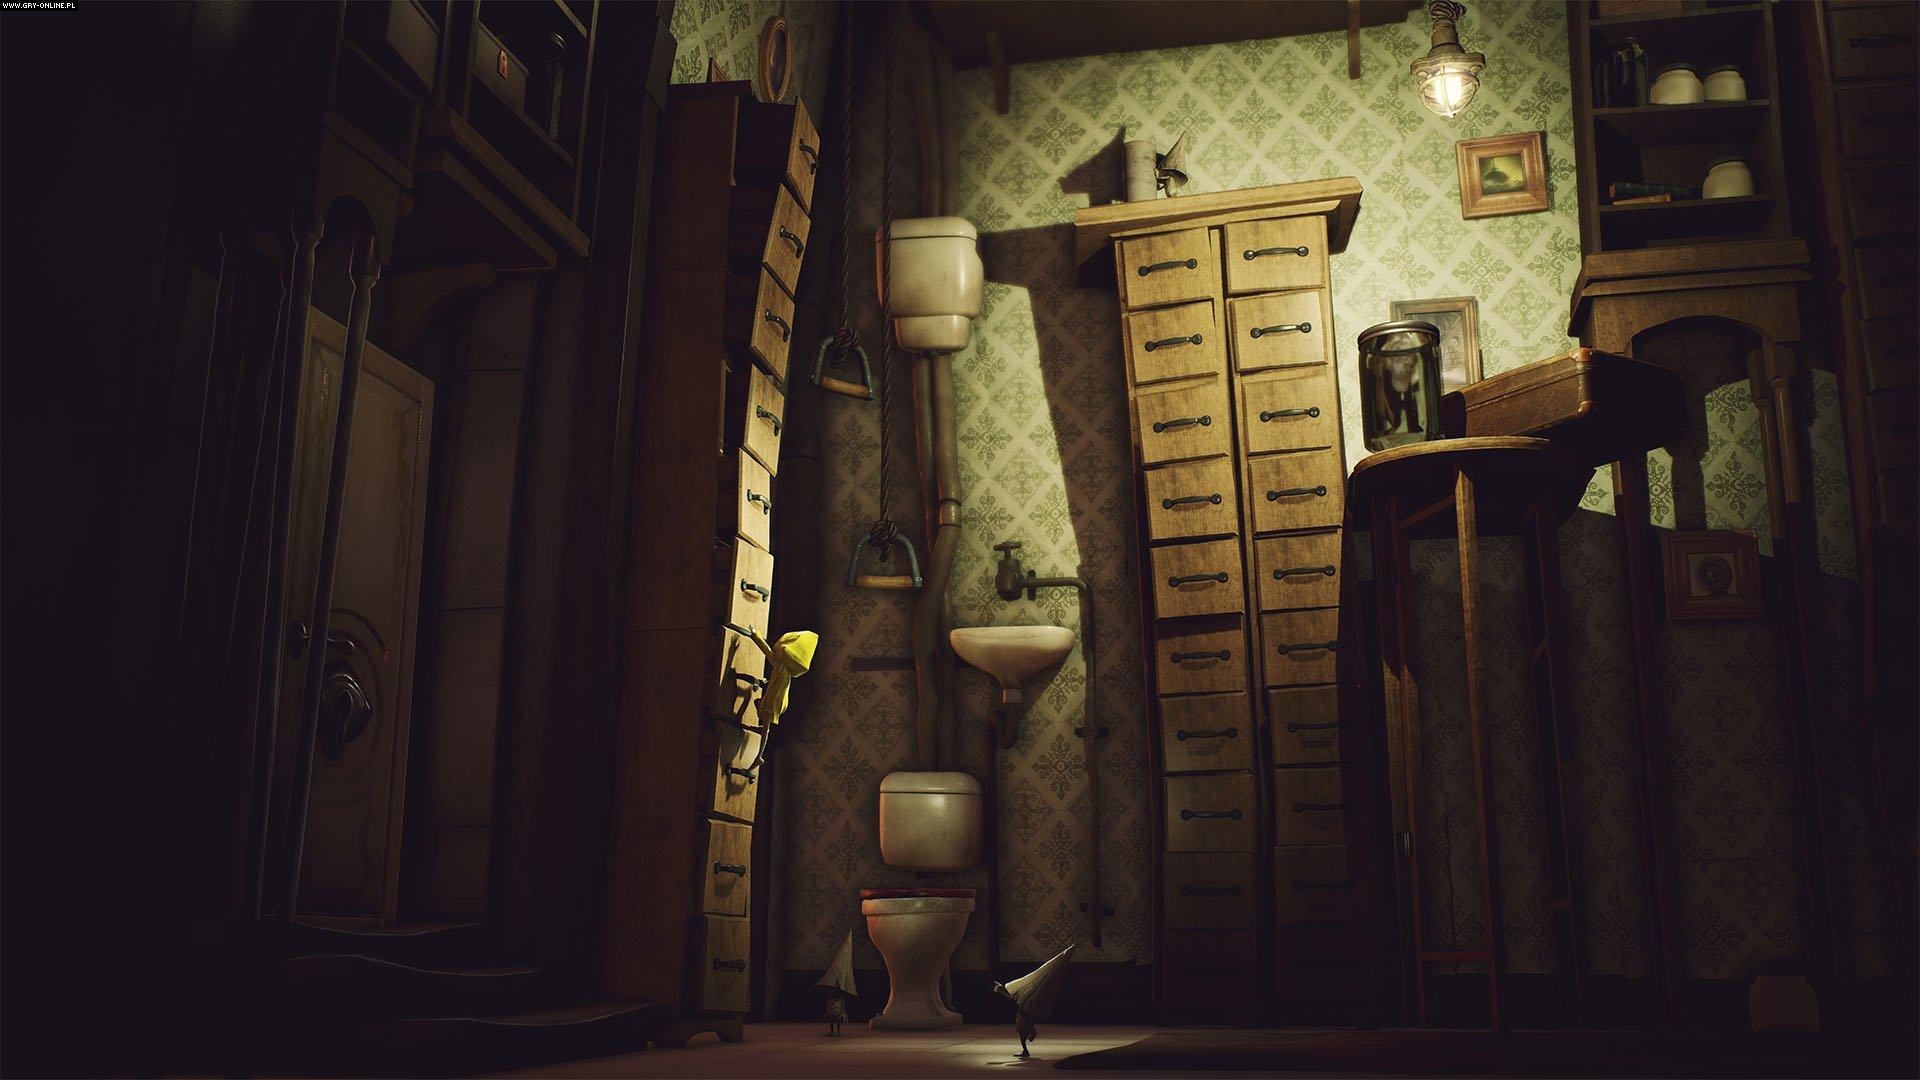 Little Nightmares PS4 Games Image 9/15, Tarsier Studios, Bandai Namco Entertainment